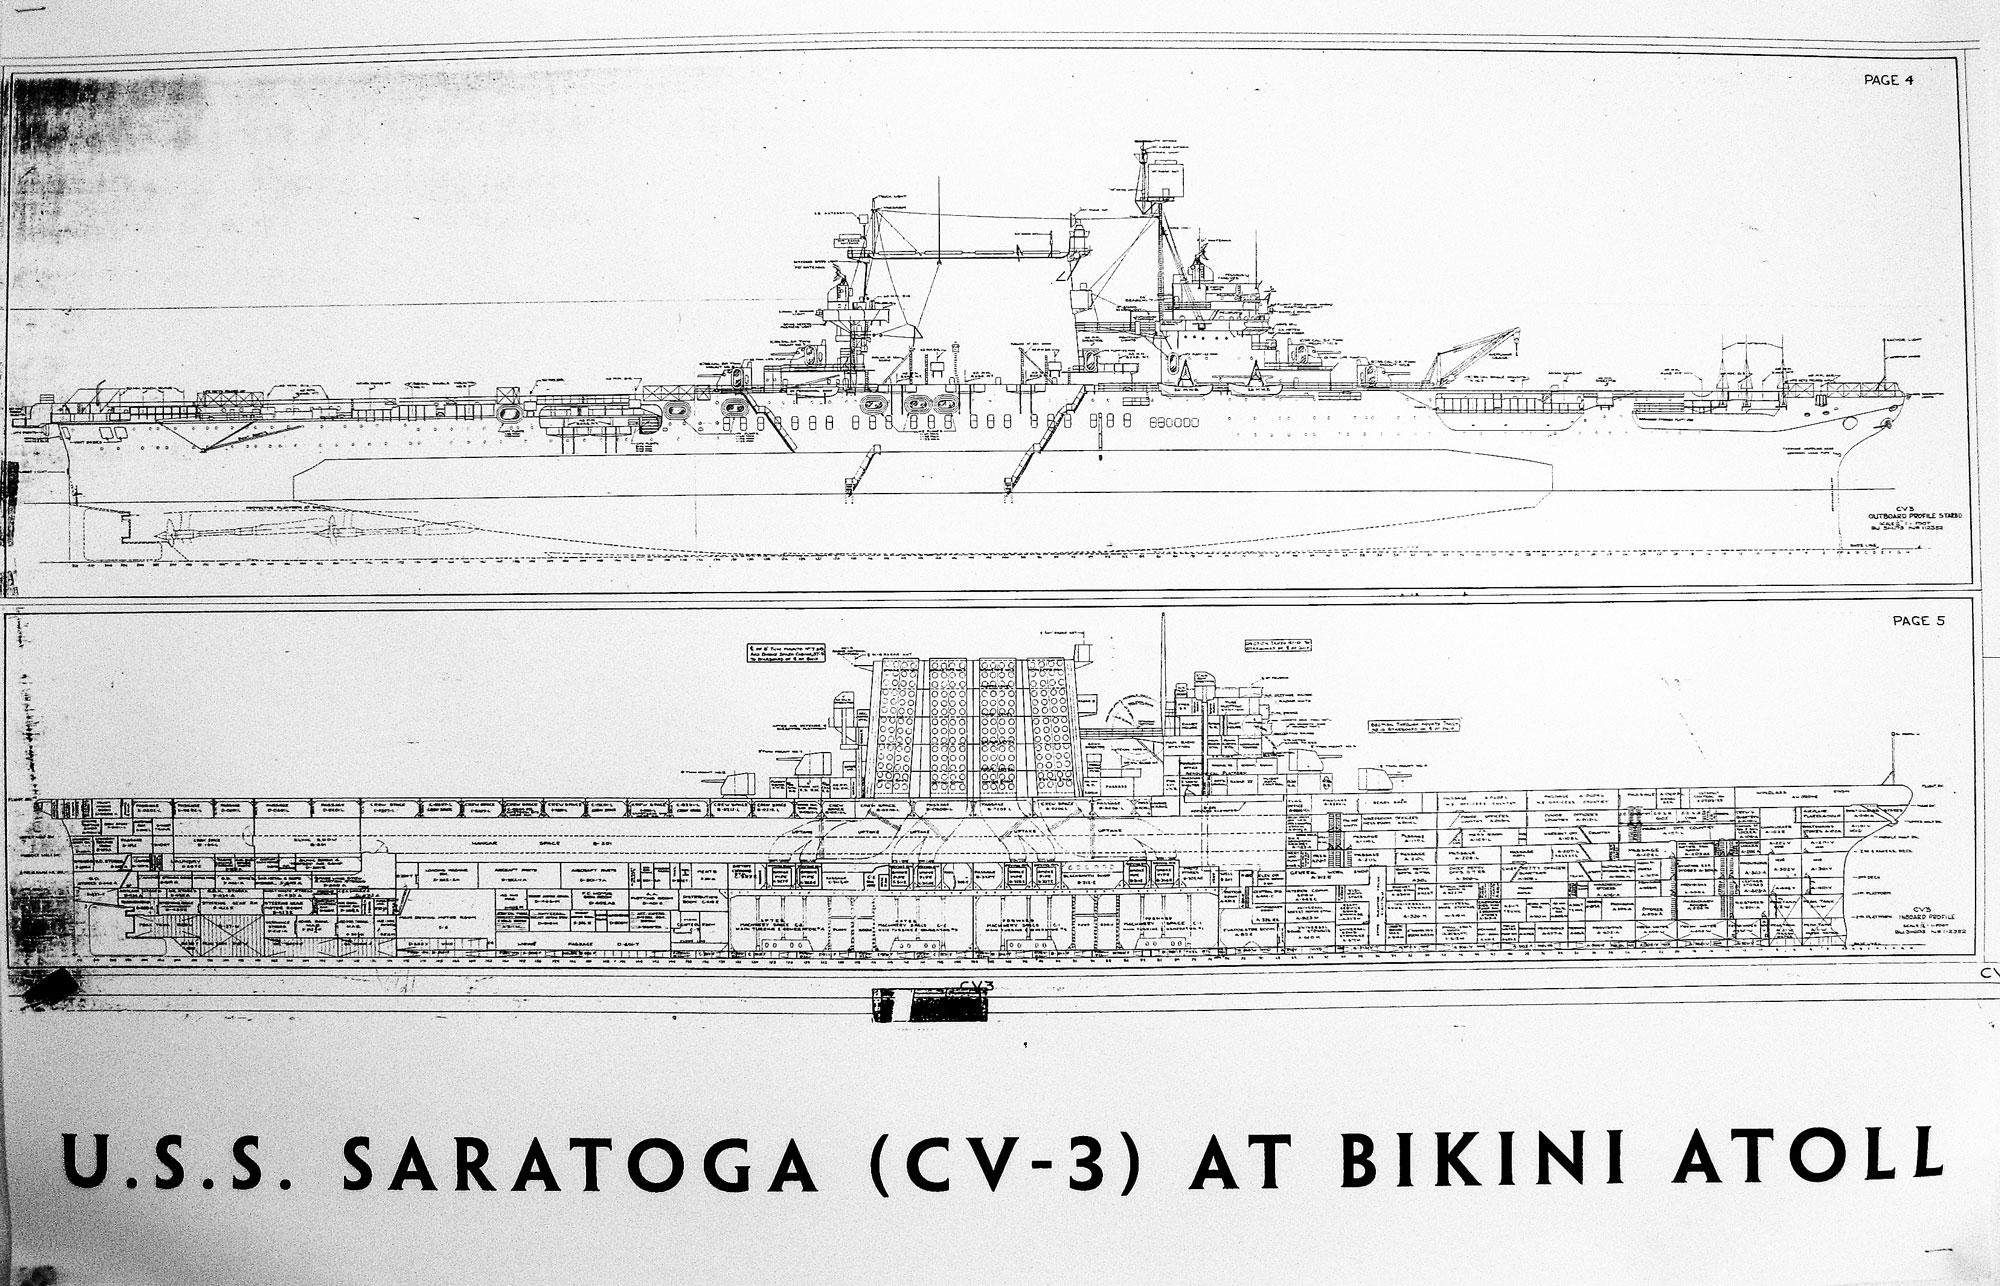 Scuba Dive Bikini Atoll The Doctor 200 Amp Sub Panel Wiring Diagram Plans Of Aircraft Carrier Uss Saratoga Cv 3